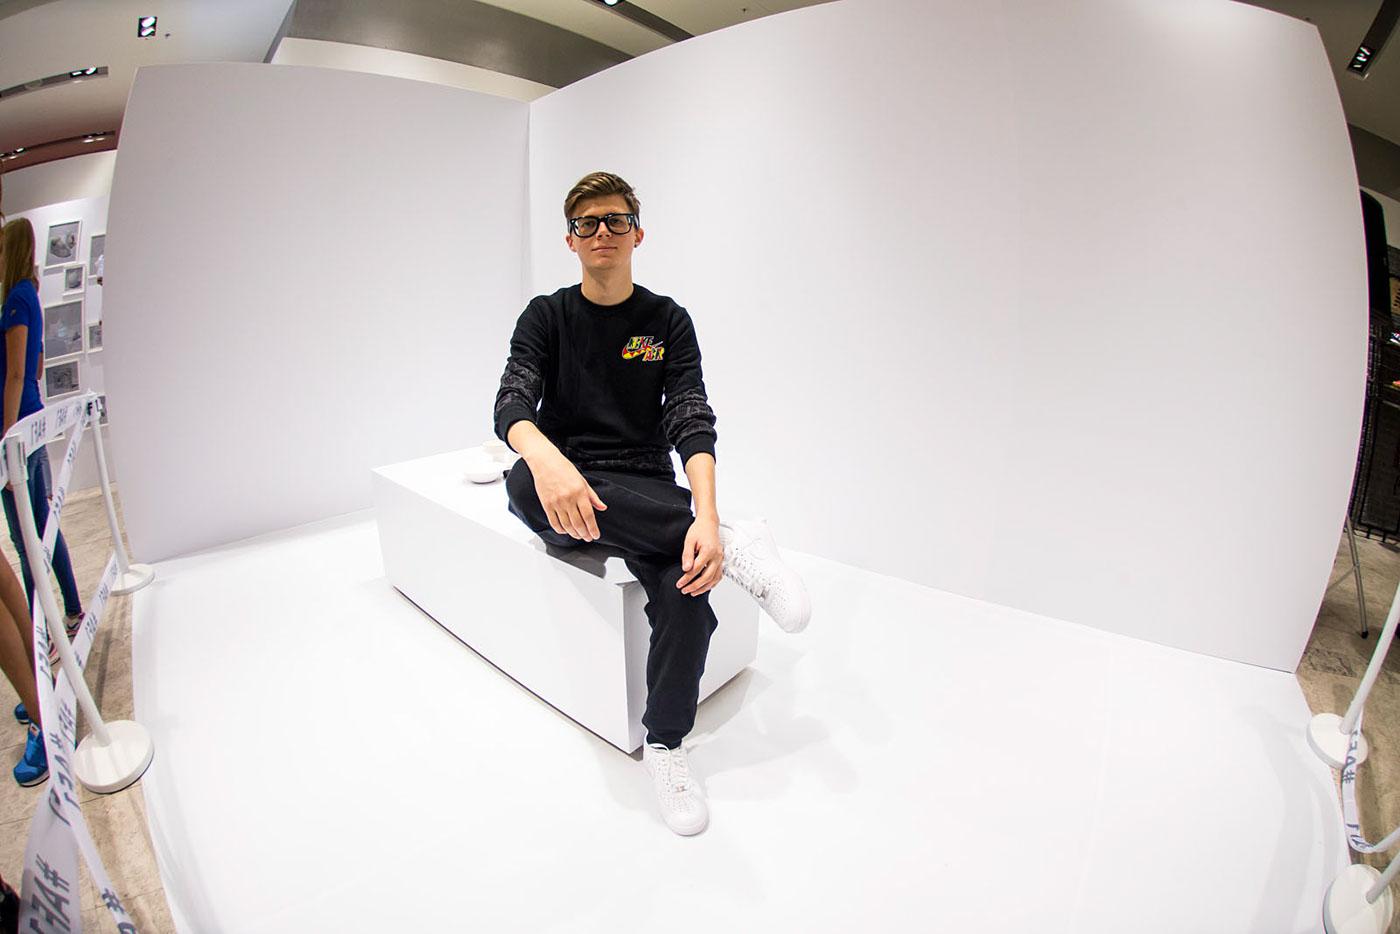 Nike pokras pokras lampas Performance air force art vogue fashion week Tsvetnoy